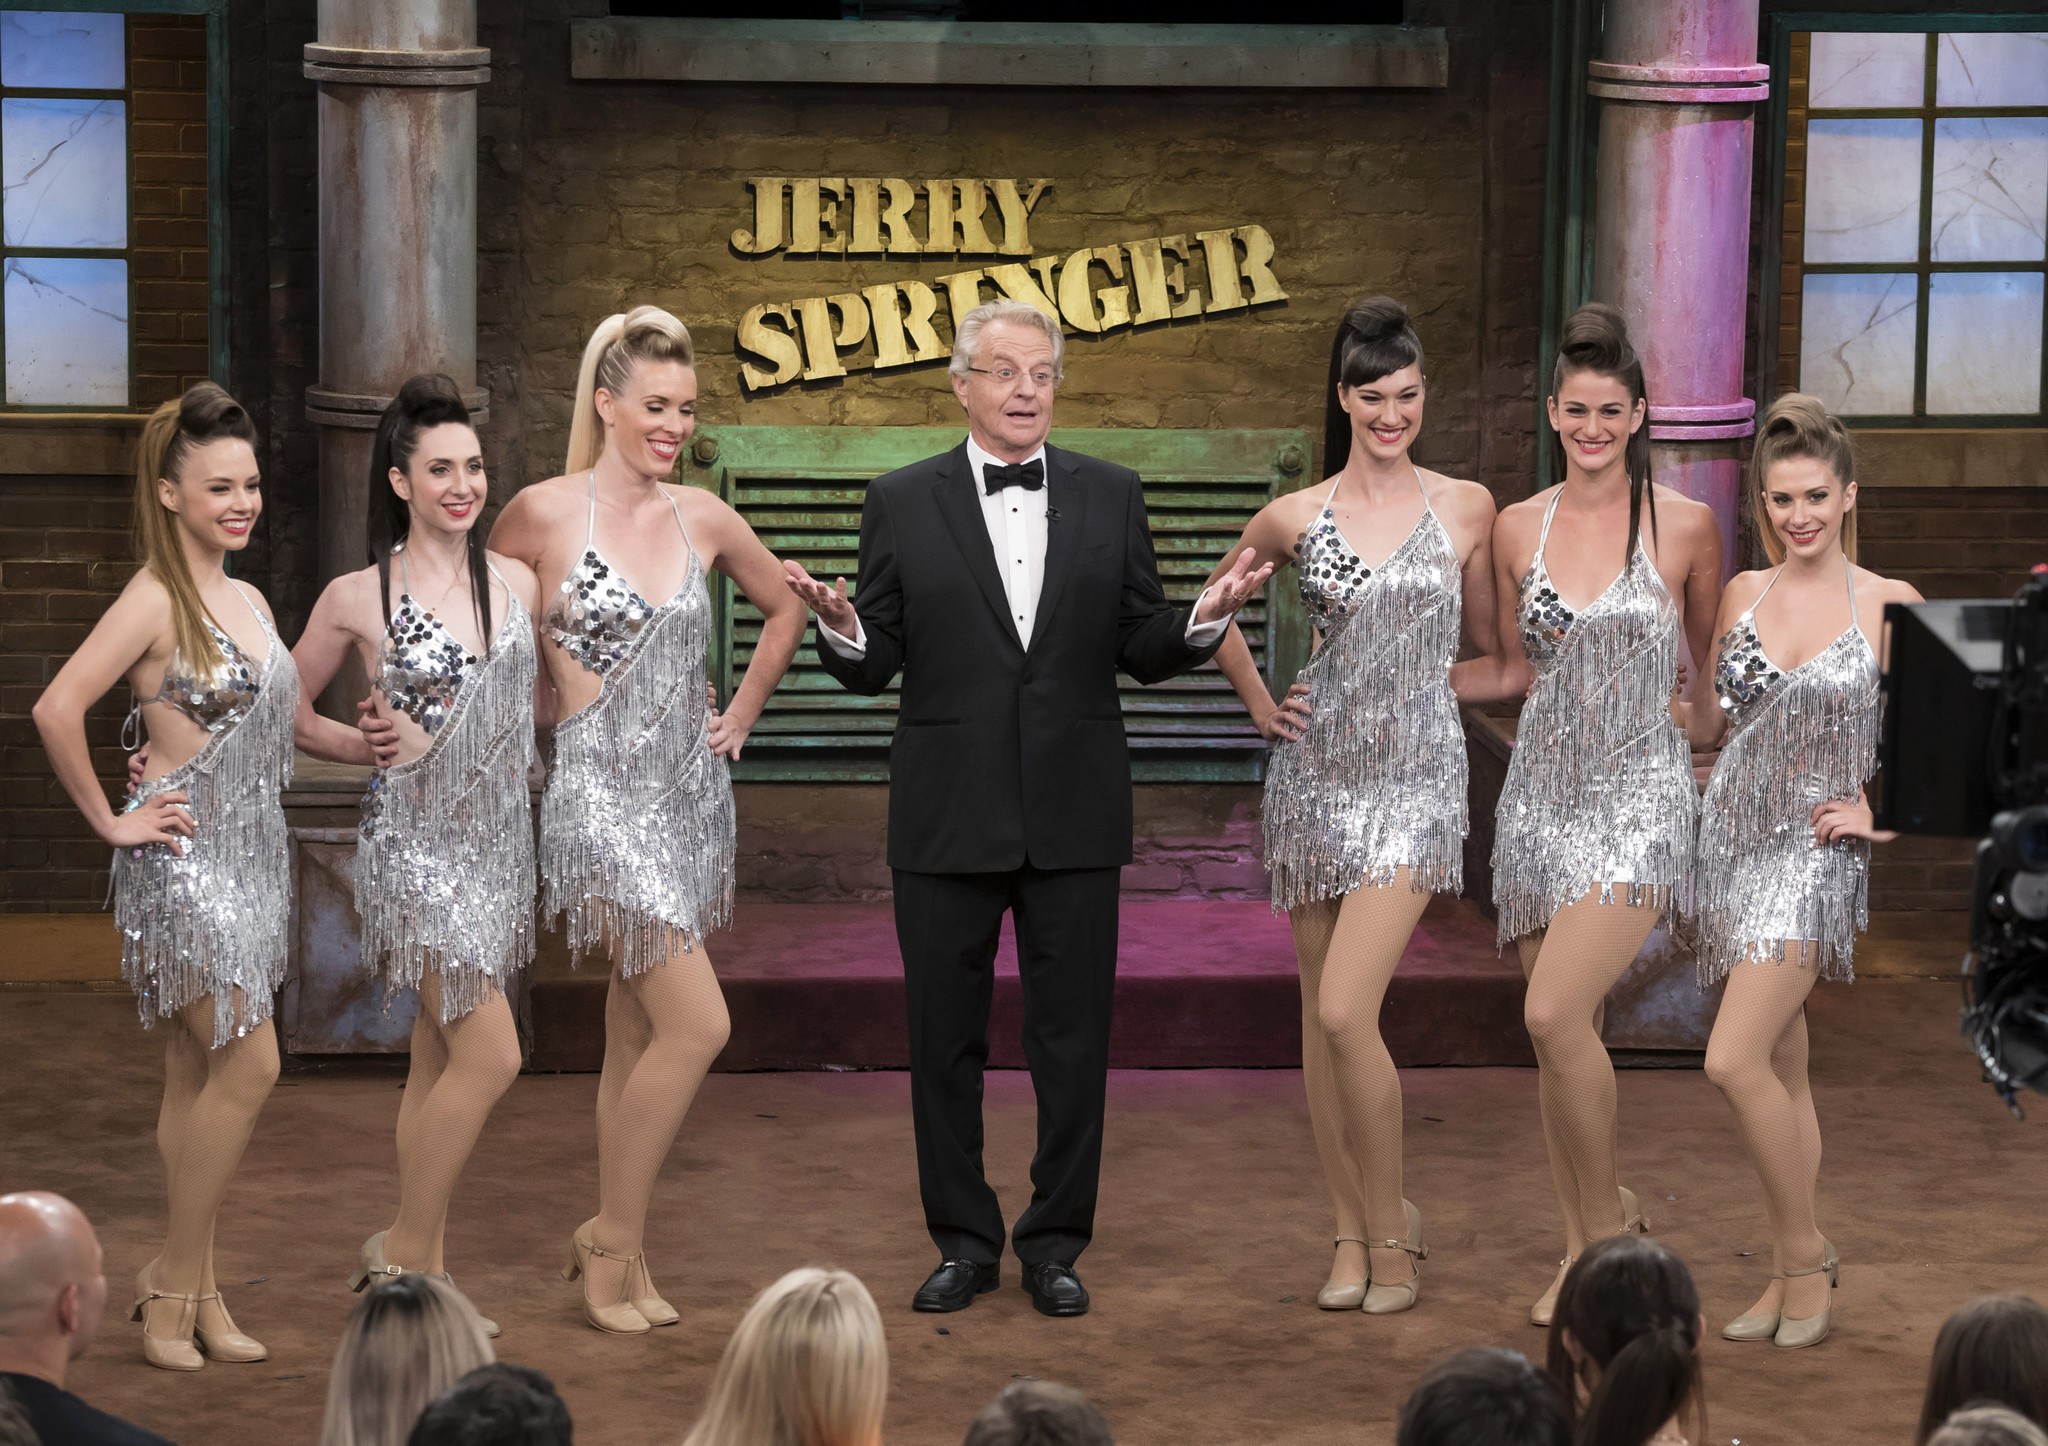 Jerry Springer Show Celebrates 25 Years Chicago Tribune